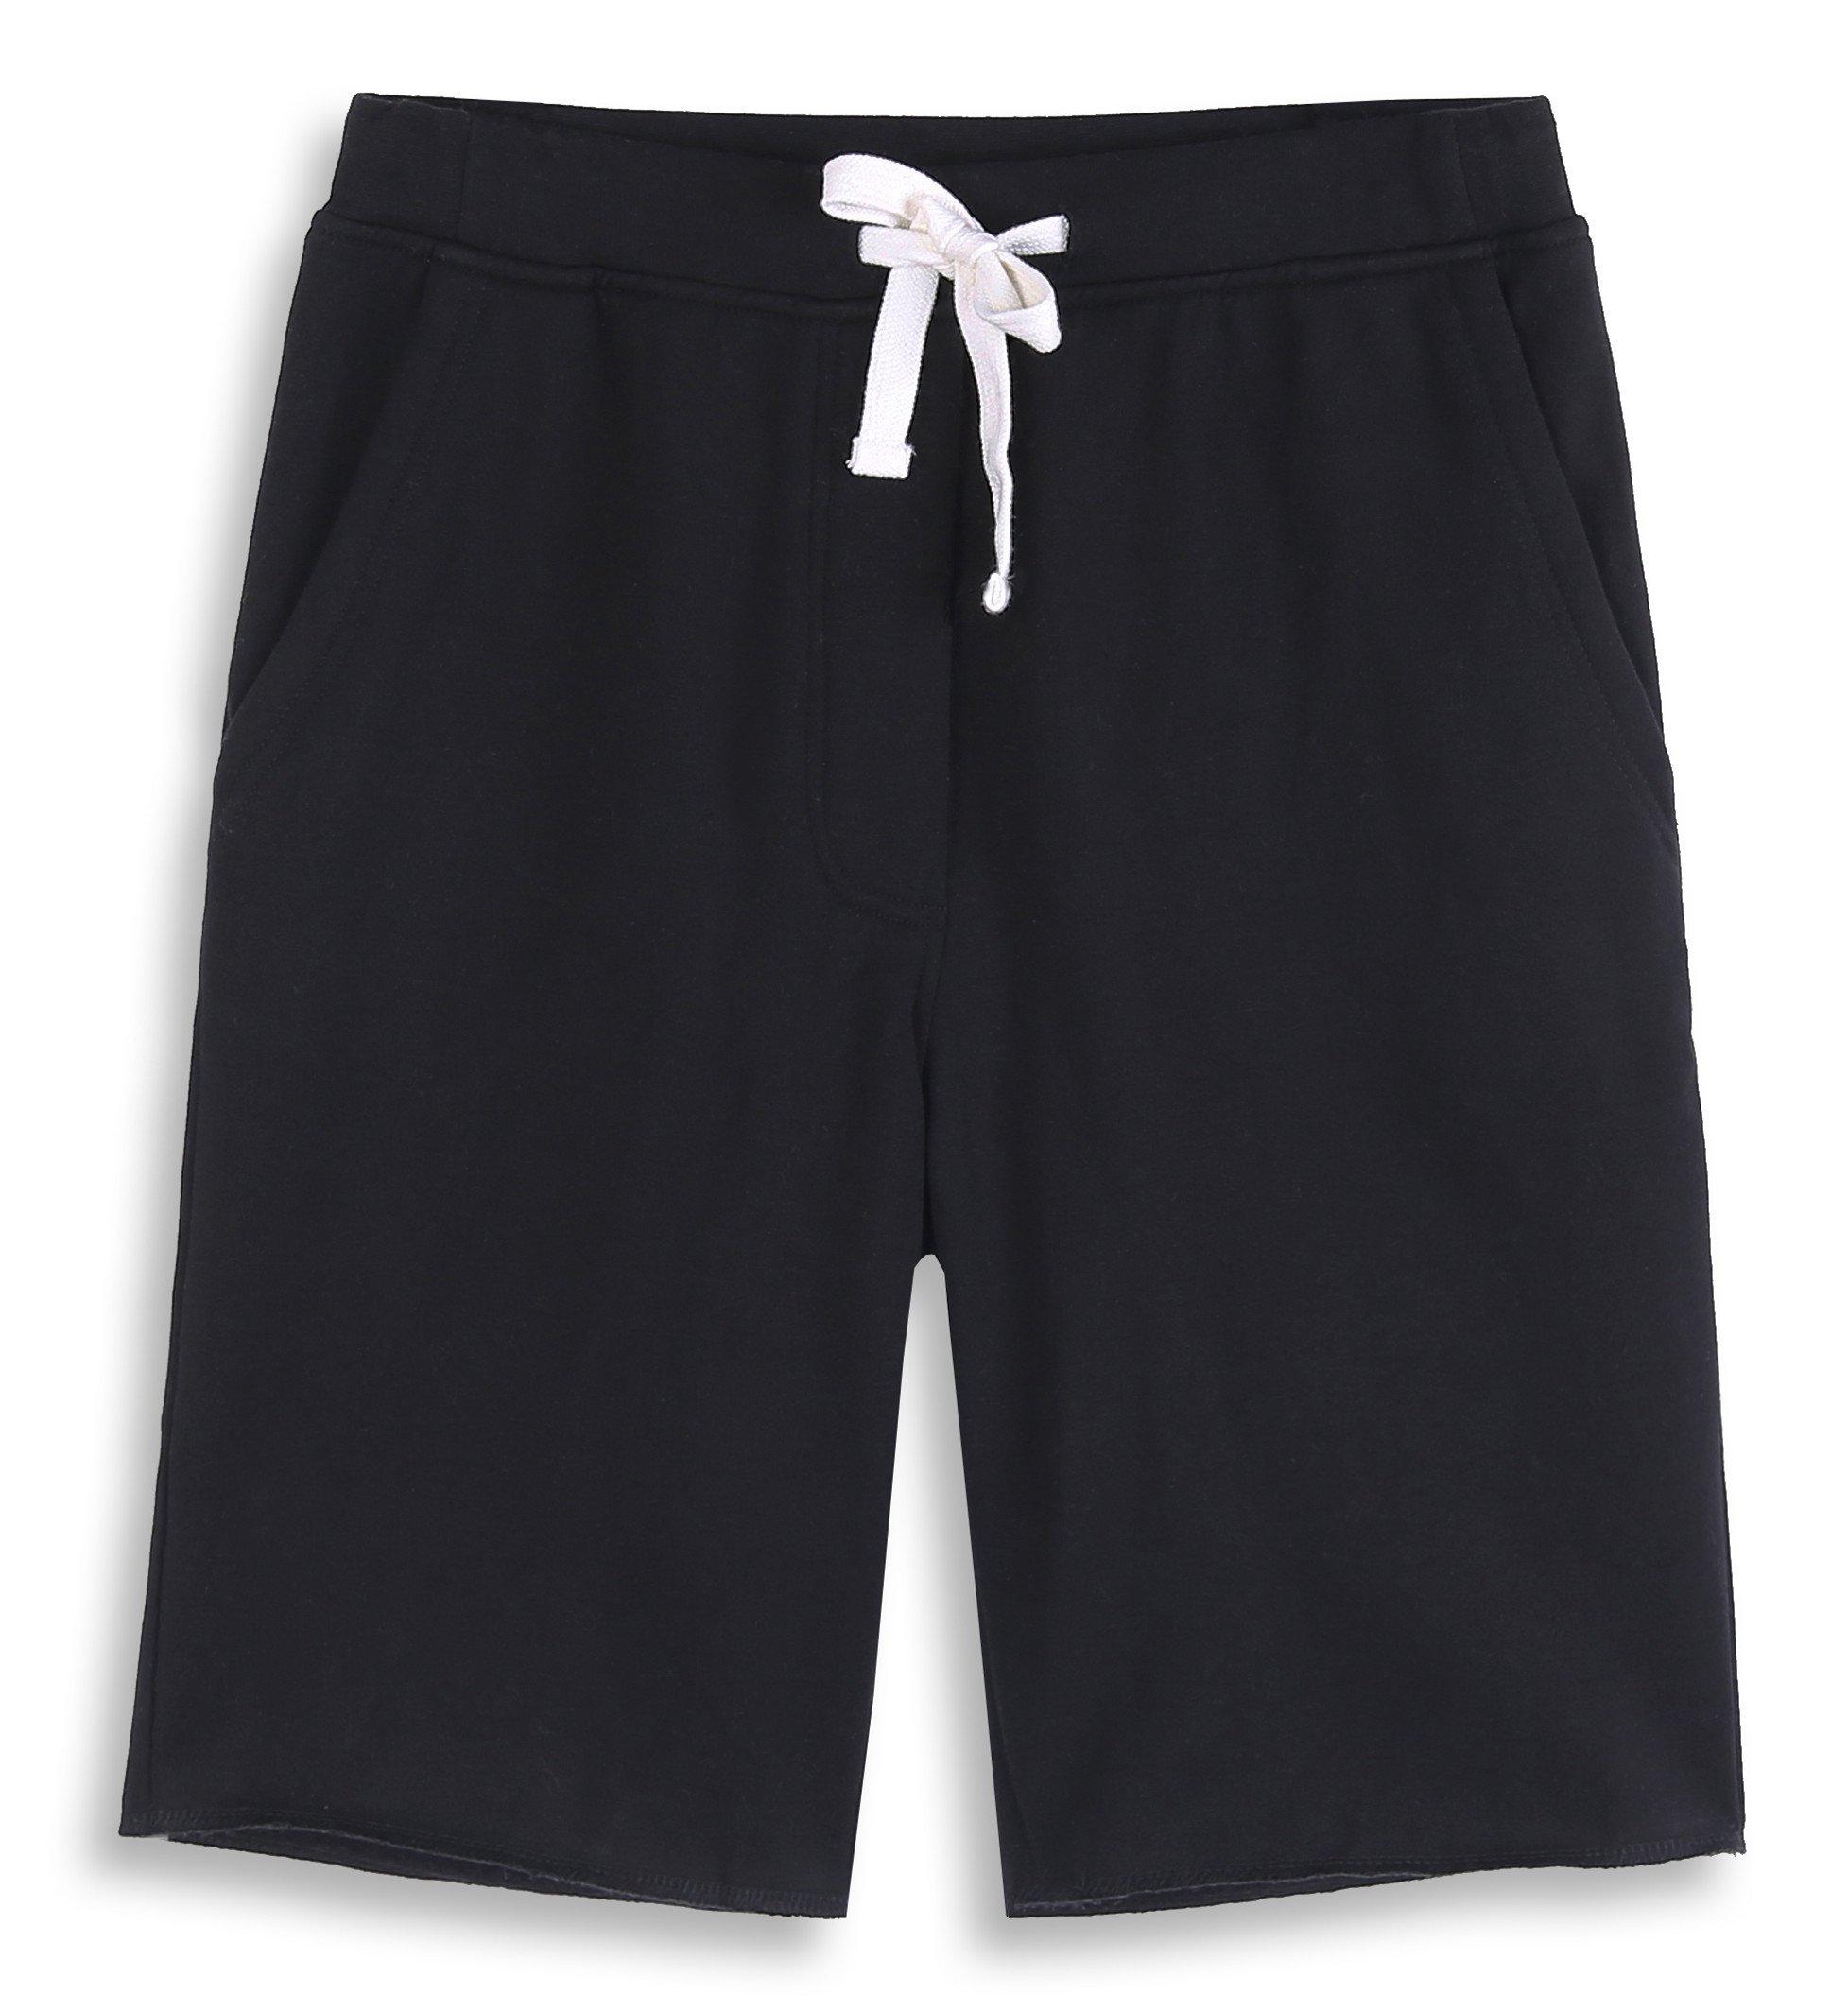 HARBETH Men's Casual Soft Cotton Elastic Fleece Jogger Gym Active Pocket Shorts Black XXL